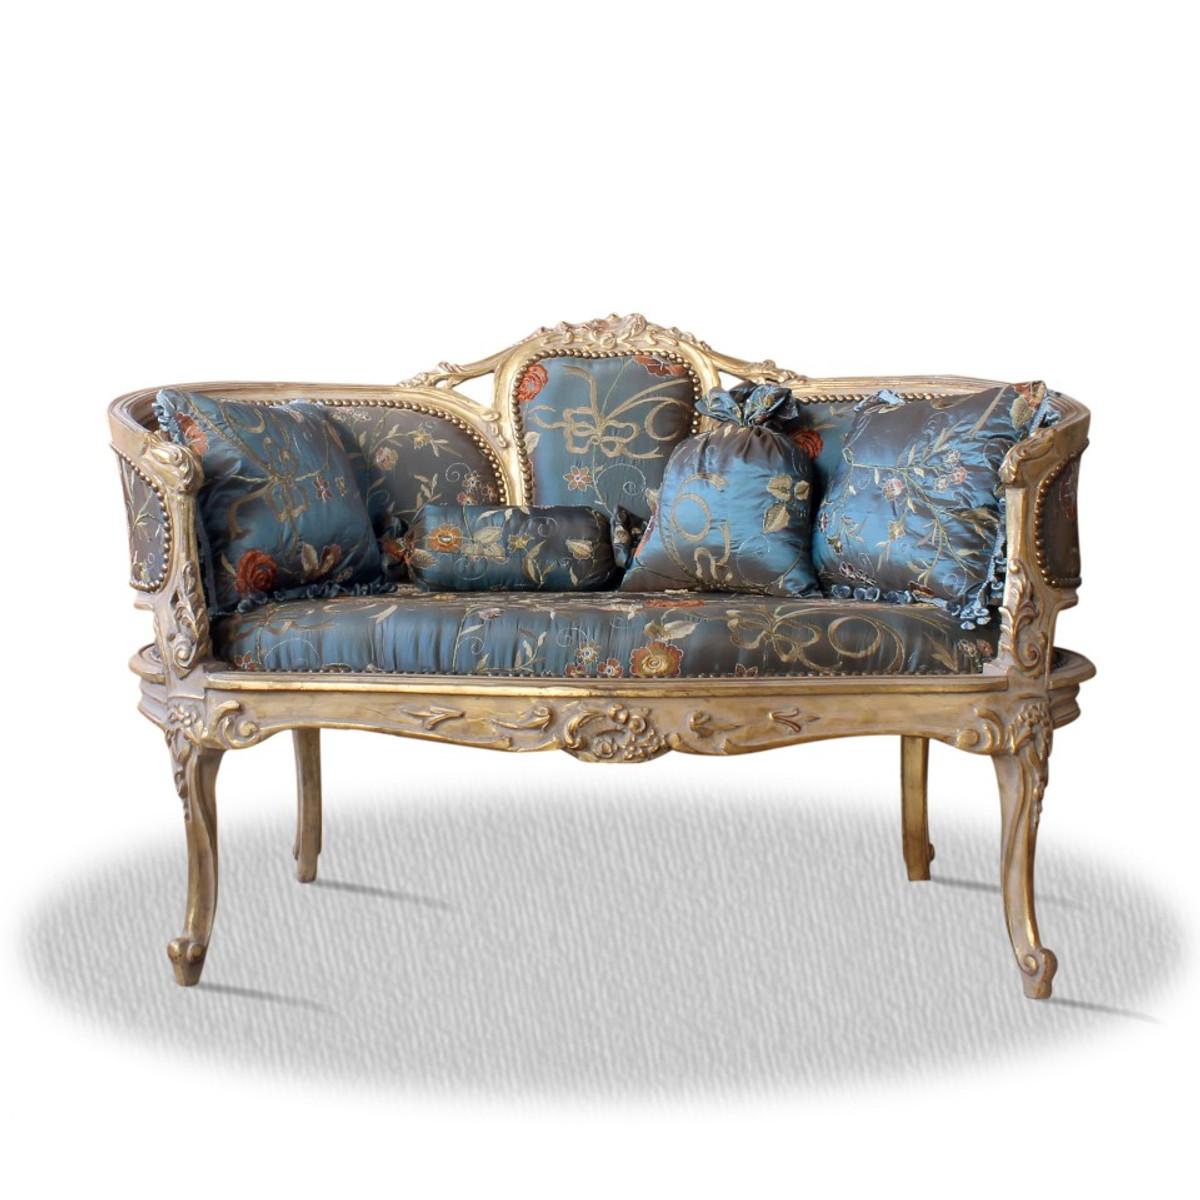 casa padrino barock sitzbank mit 4 kissen 120 x 50 x h 80 cm sitzb nke barock sitzb nke. Black Bedroom Furniture Sets. Home Design Ideas